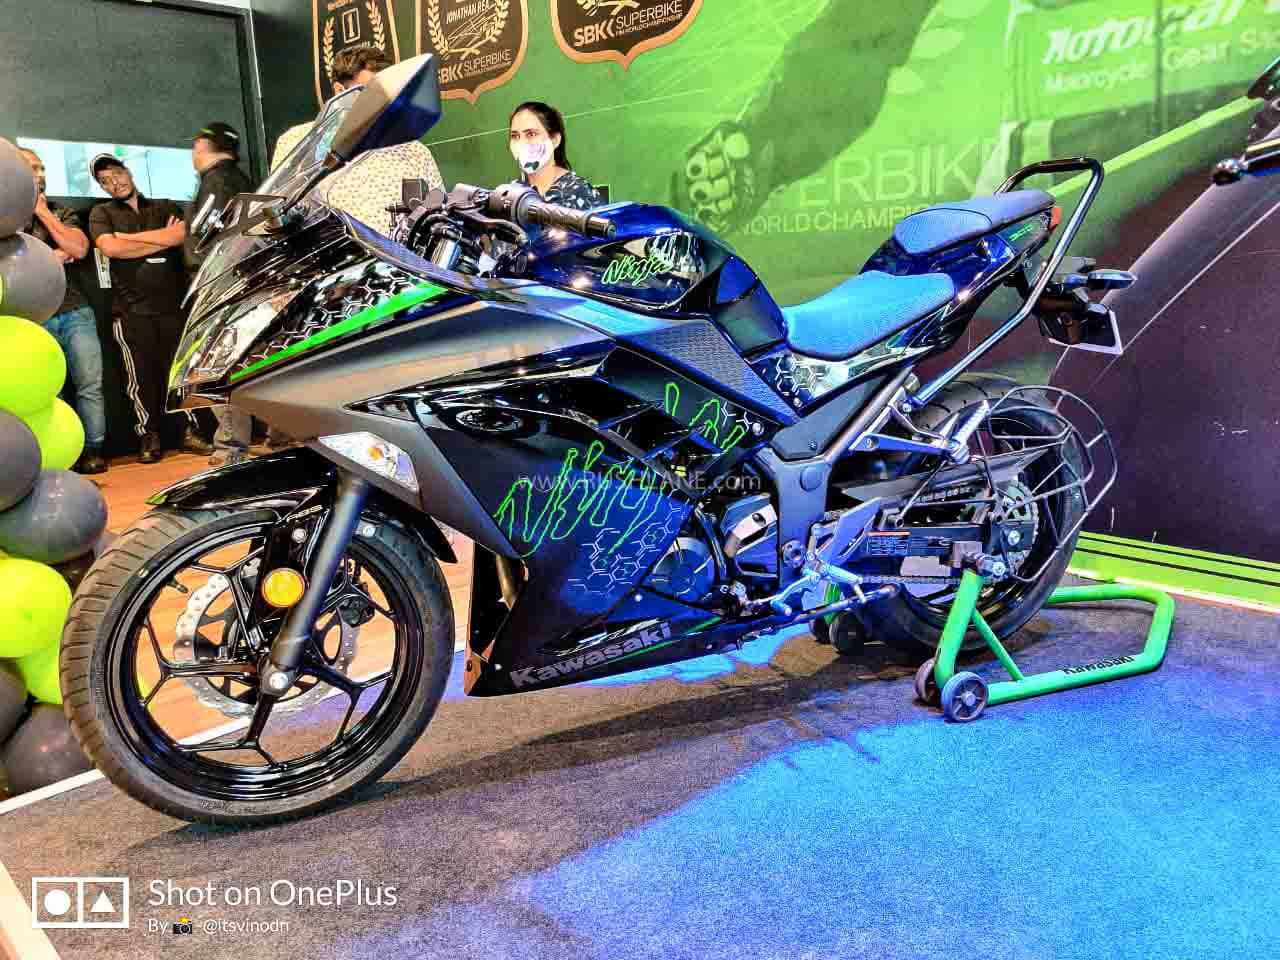 Kawasaki Ninja 300 Arrives At Dealer Showroom - First Look Walkaround - RushLane